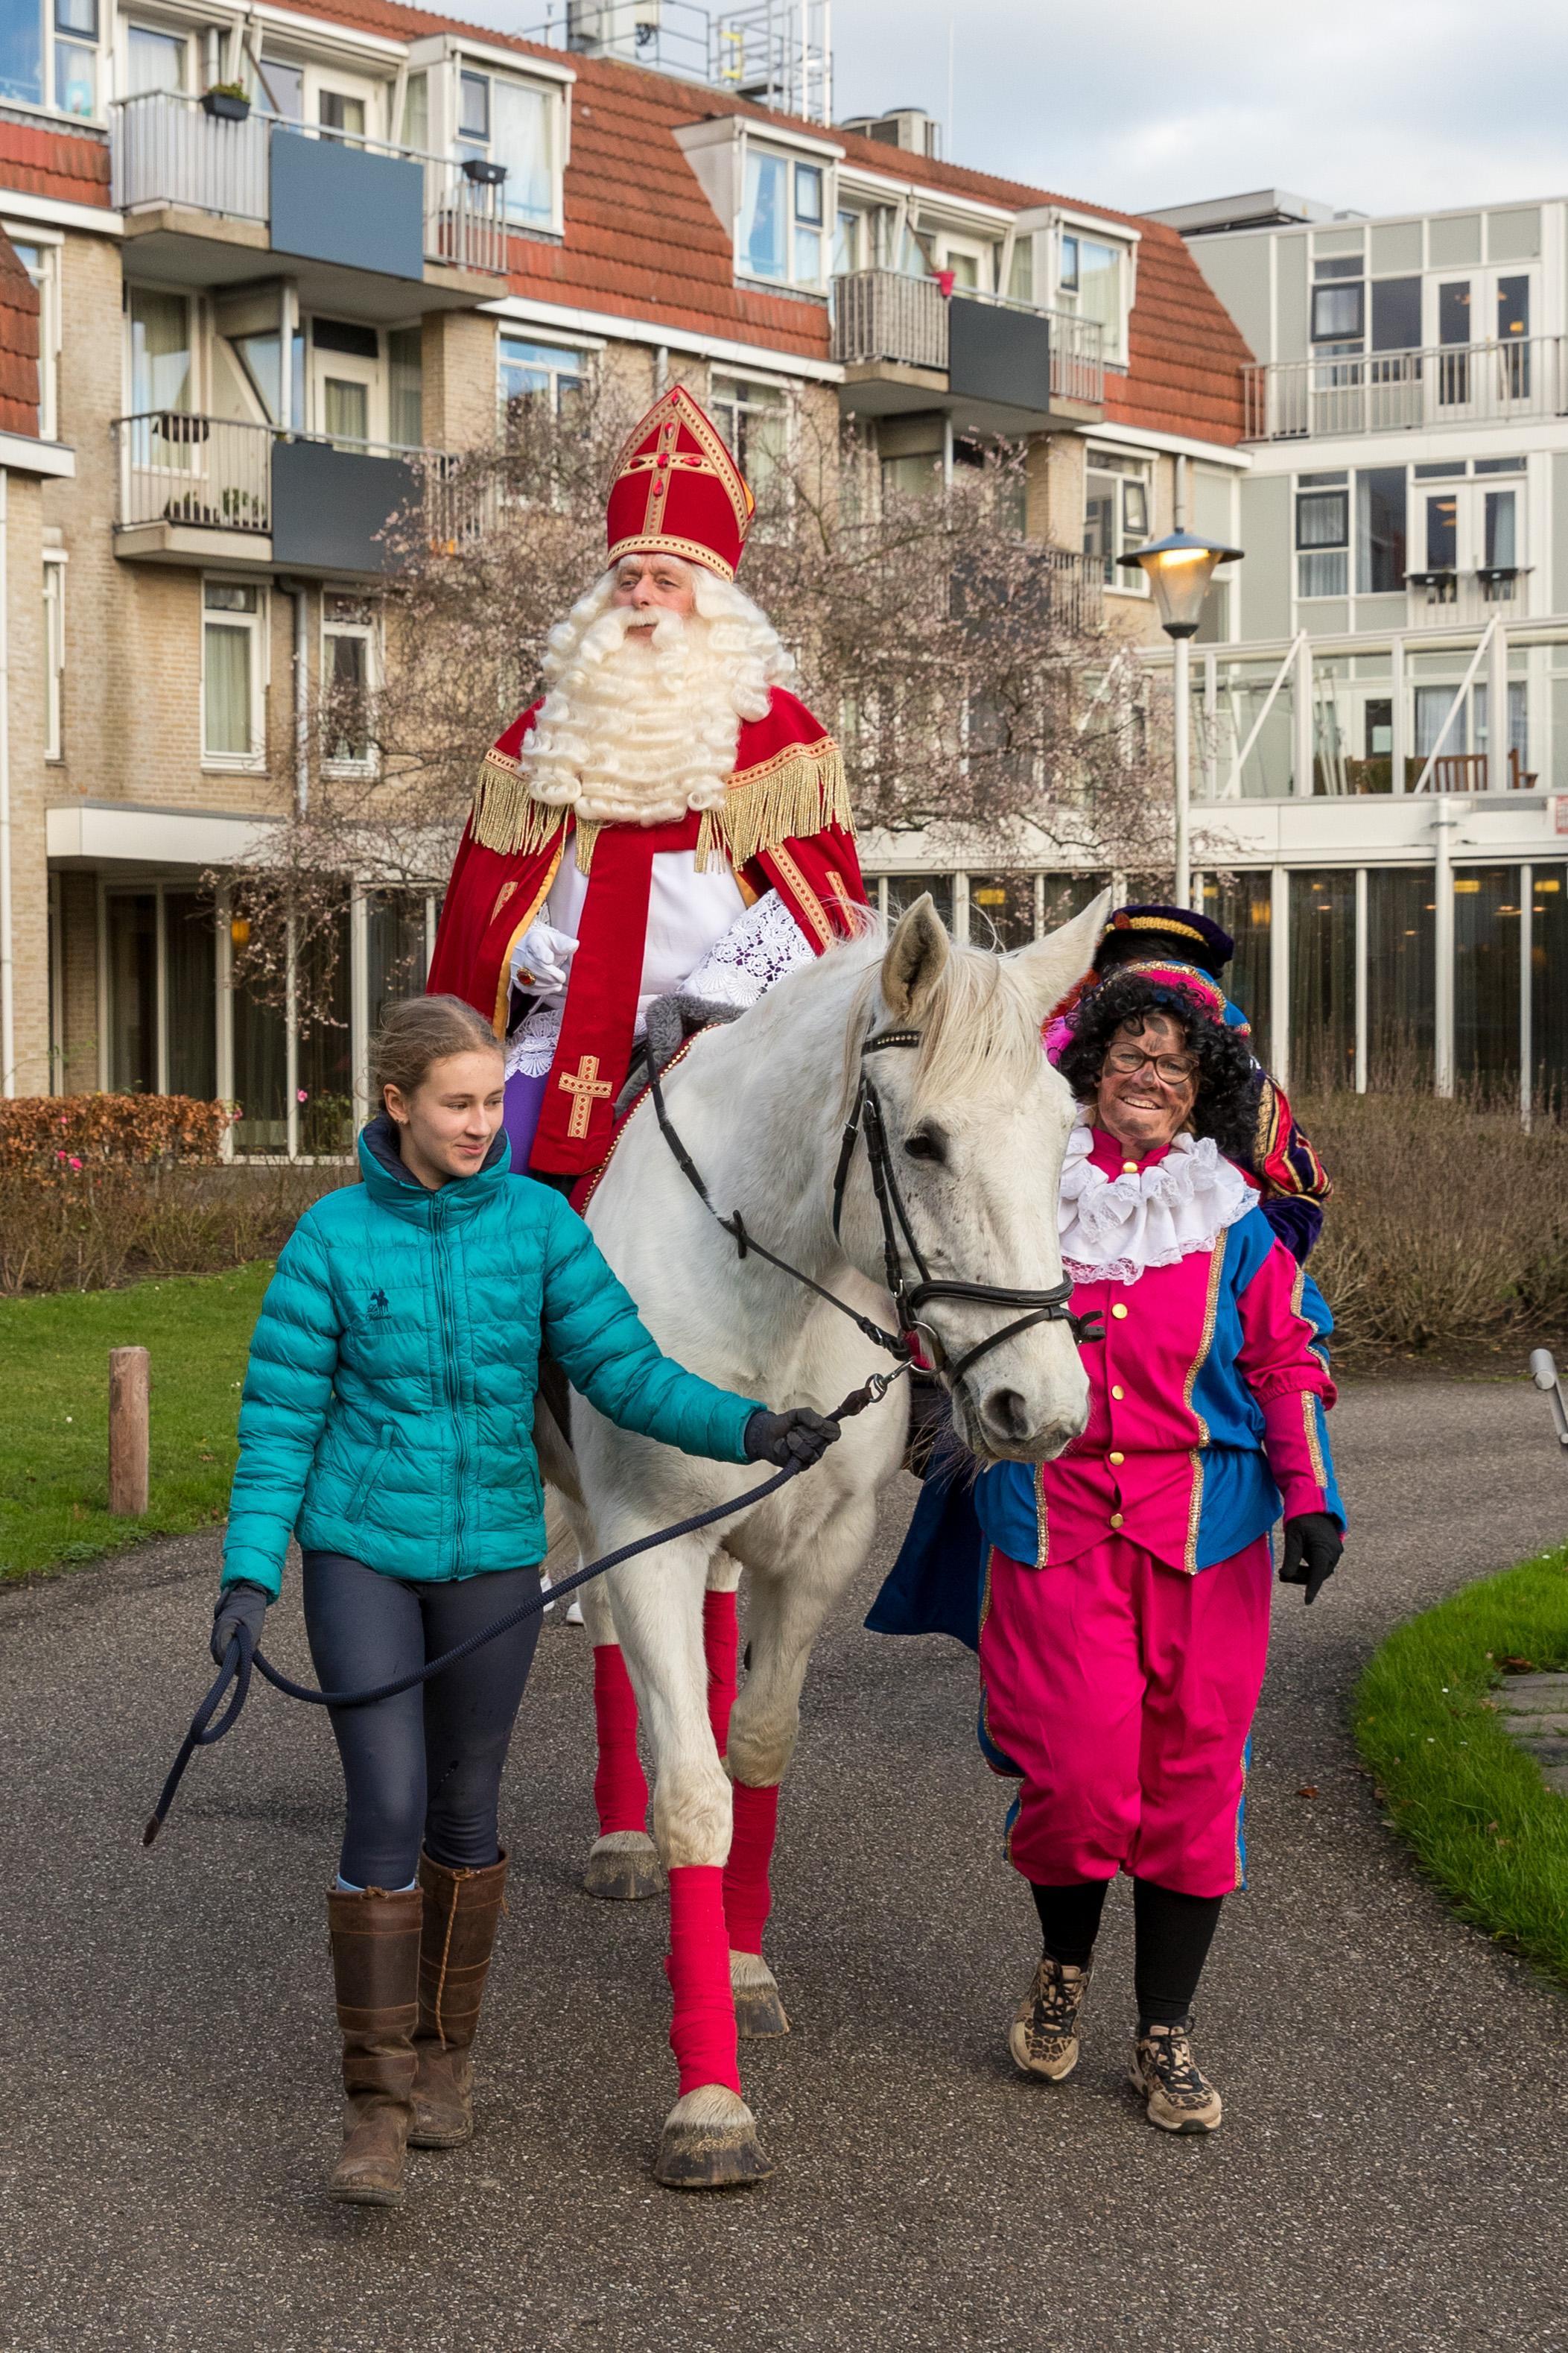 Sint komt in Hoorn, Piet gaat in Enkhuizen [video]